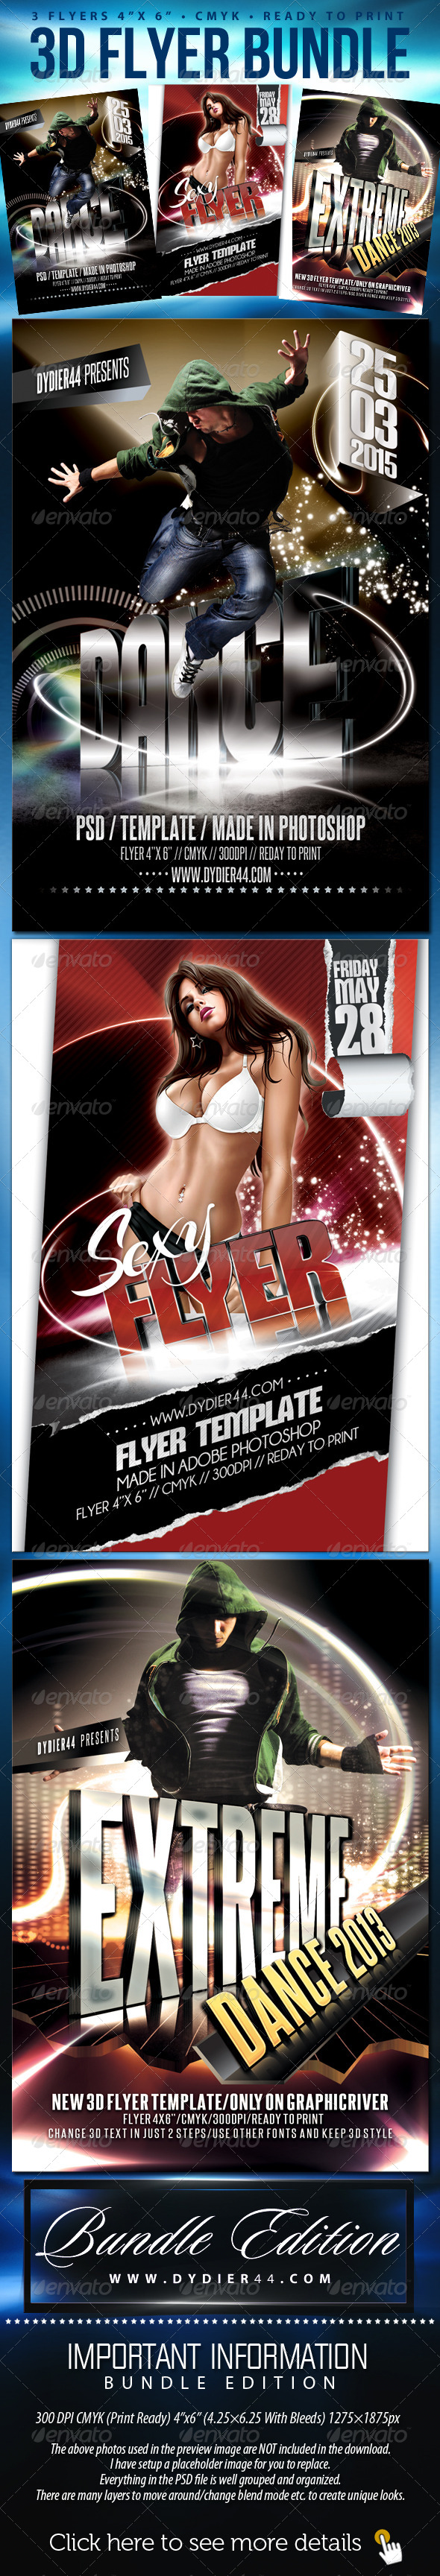 GraphicRiver Dydier44 Bundle Flyer Template 4x6 5392641